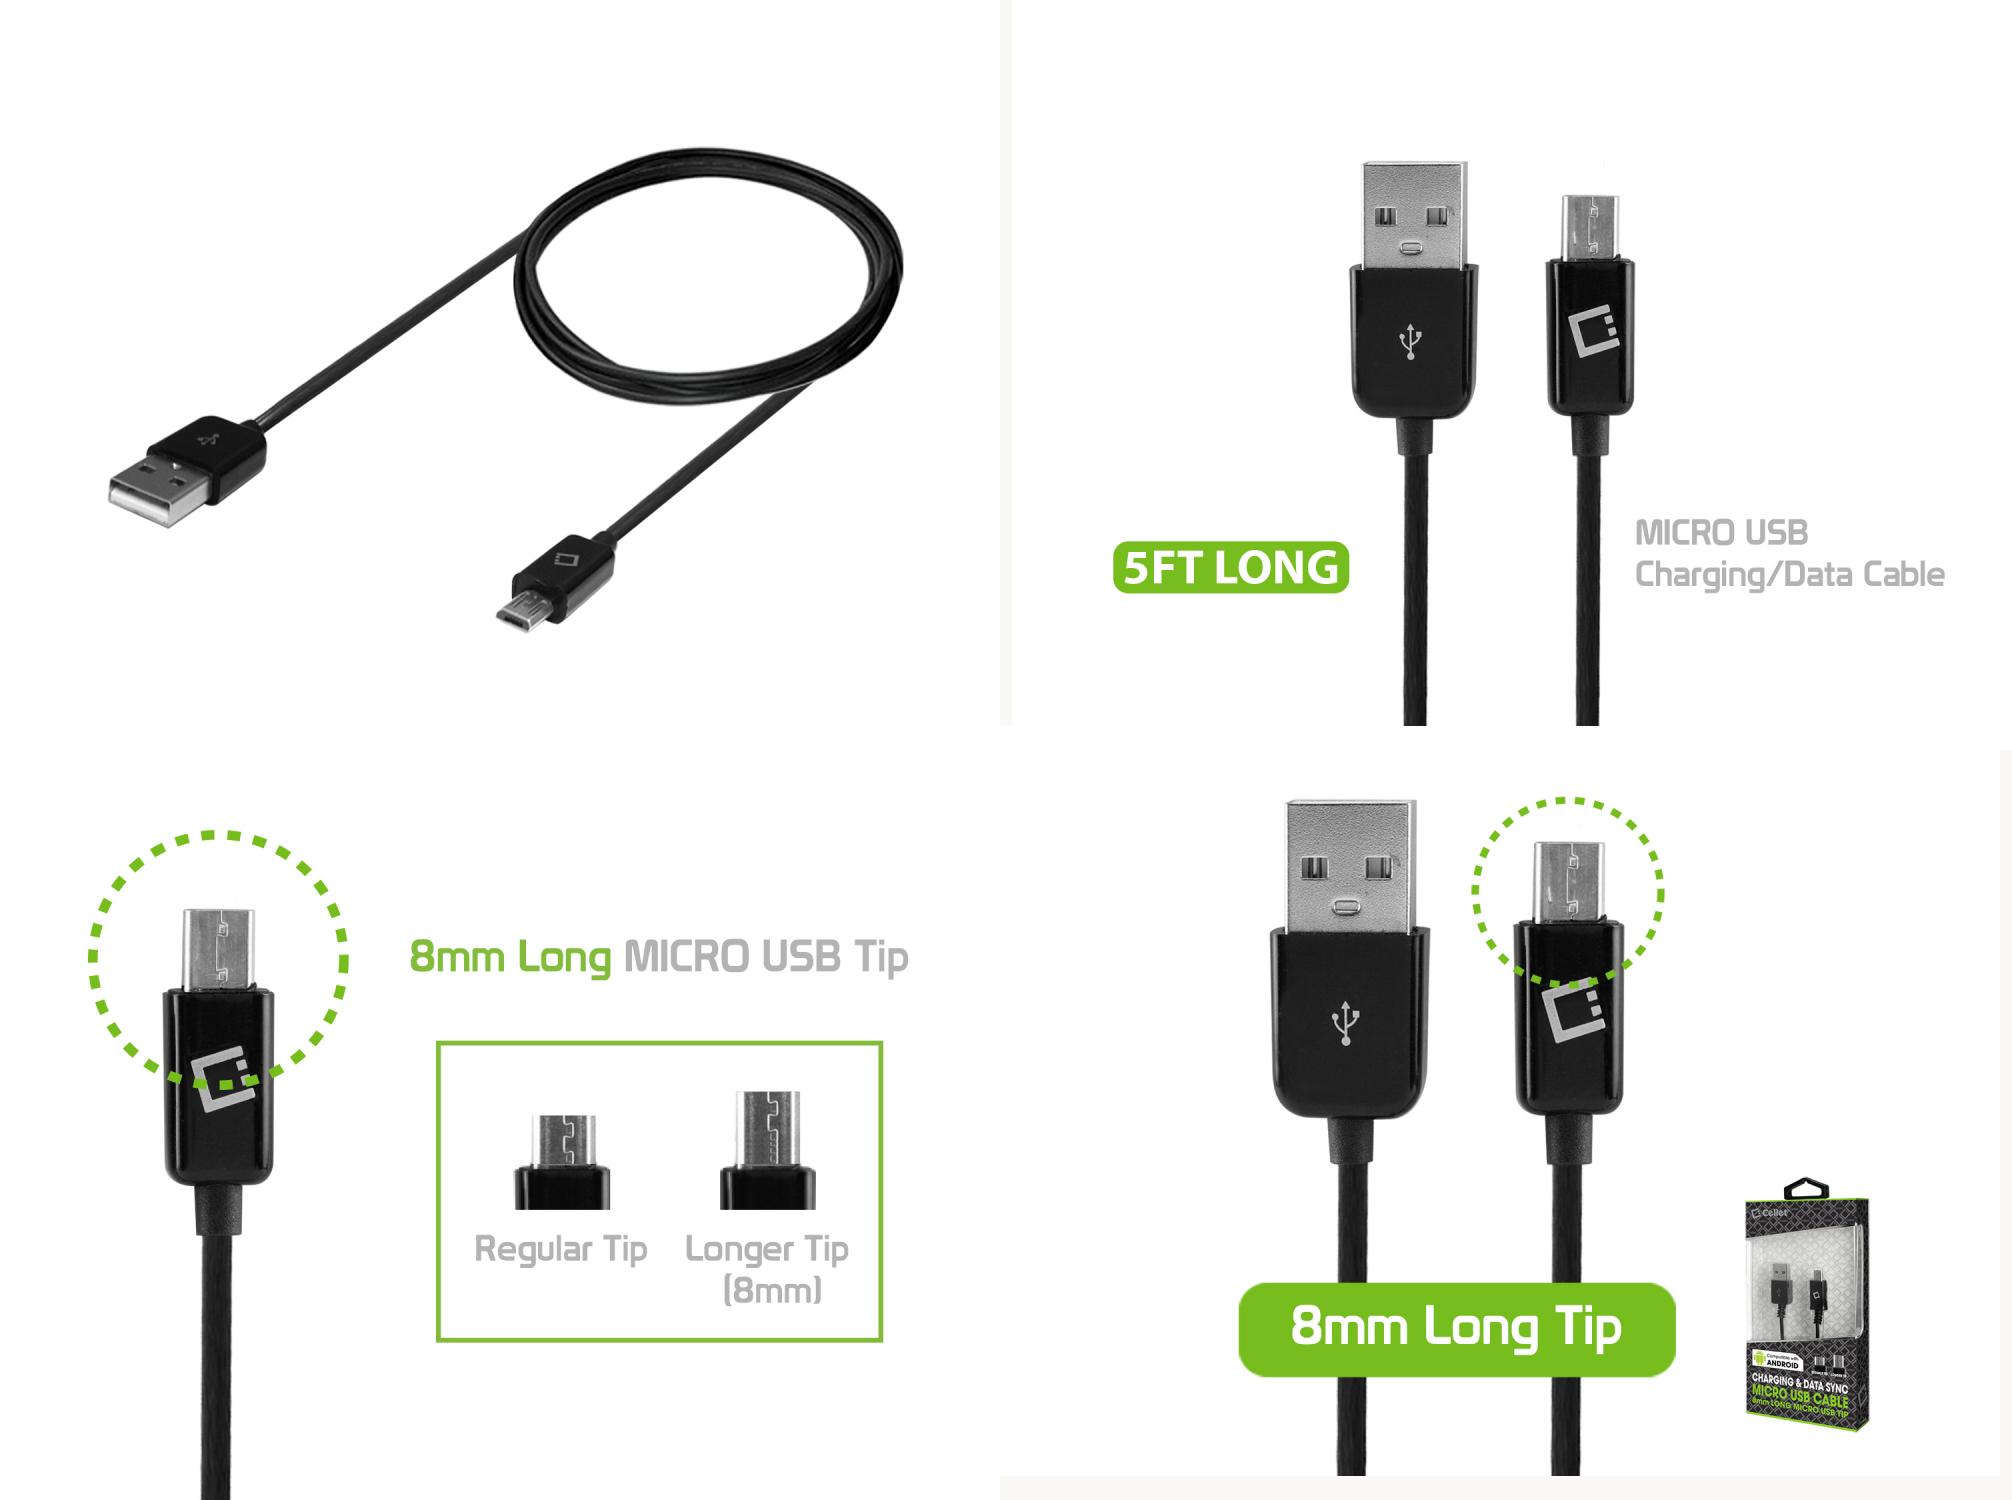 CABLE USB MICRO USB LONG 8mm